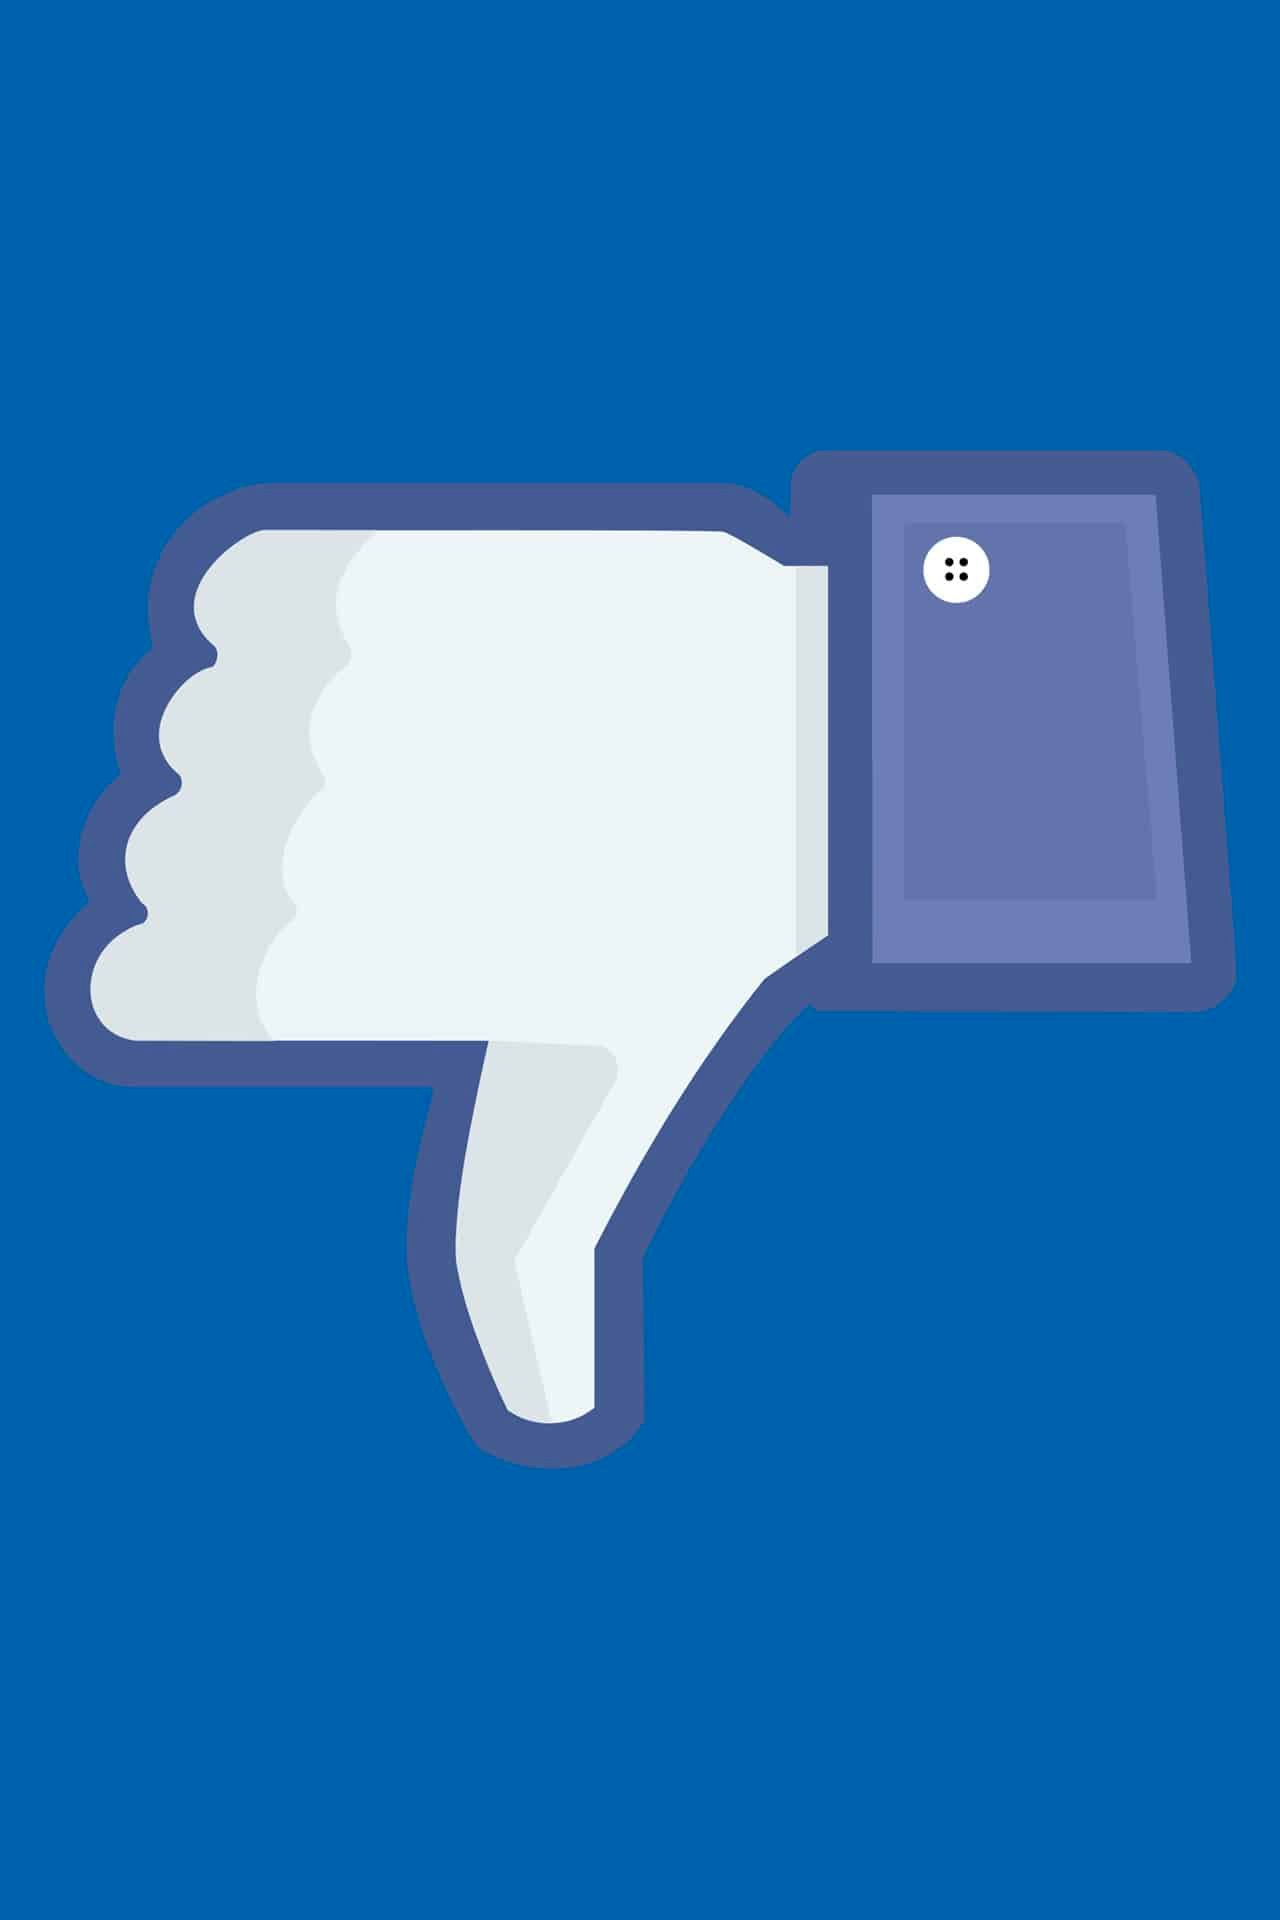 Facebook Whatsapp e Instagram in down